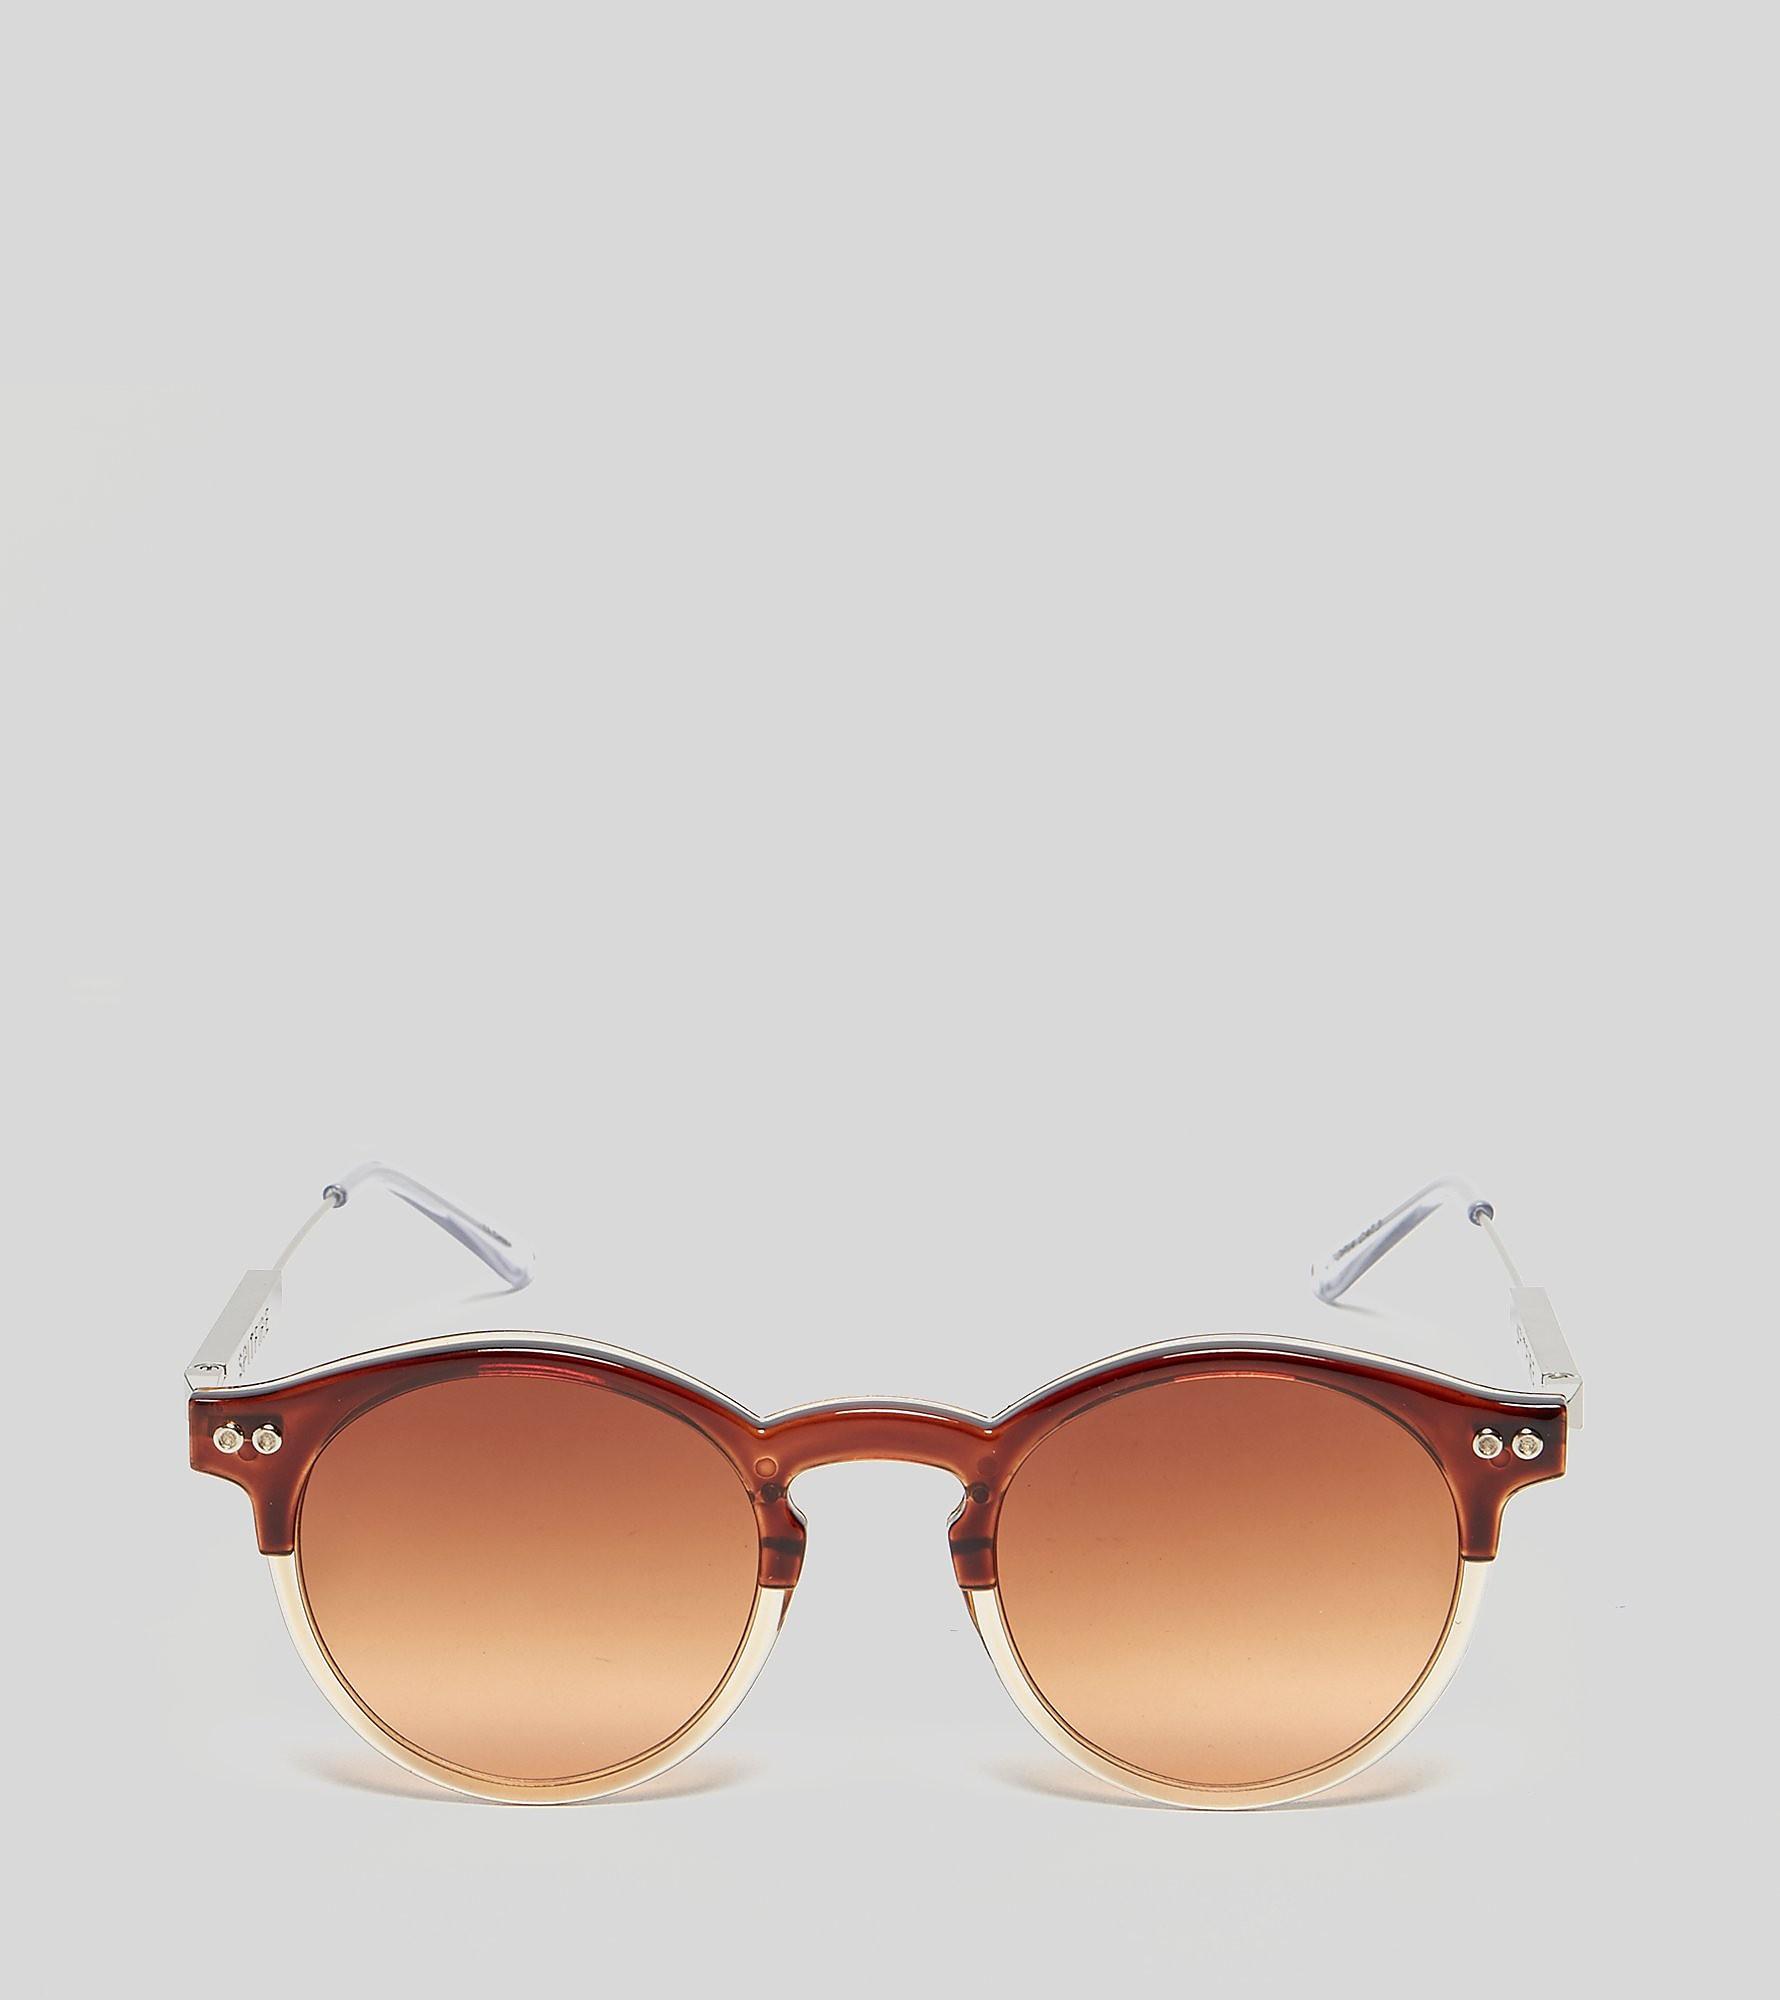 Spitfire Uptopia Sunglasses